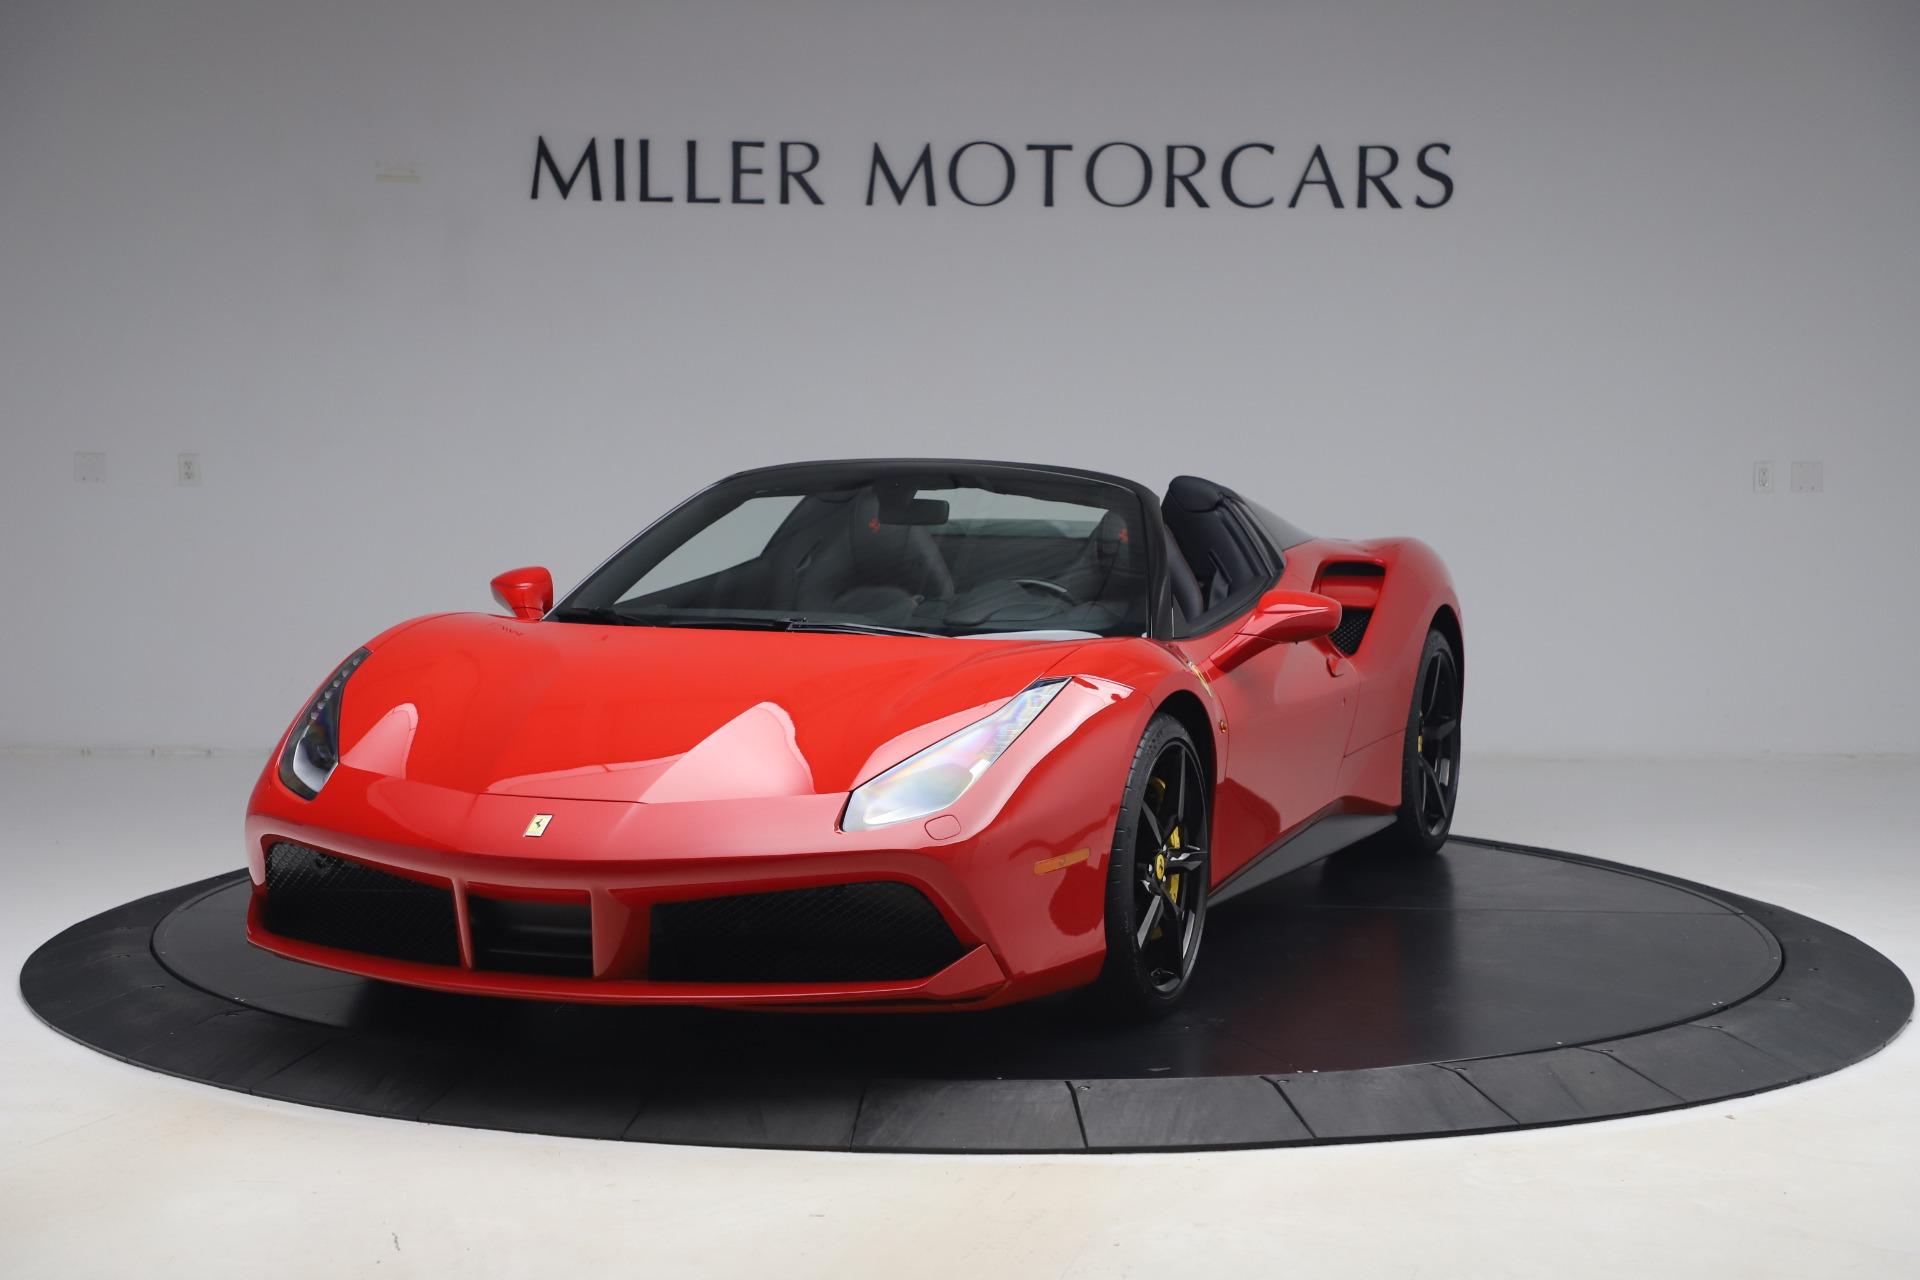 Used 2018 Ferrari 488 Spider for sale $286,900 at McLaren Greenwich in Greenwich CT 06830 1